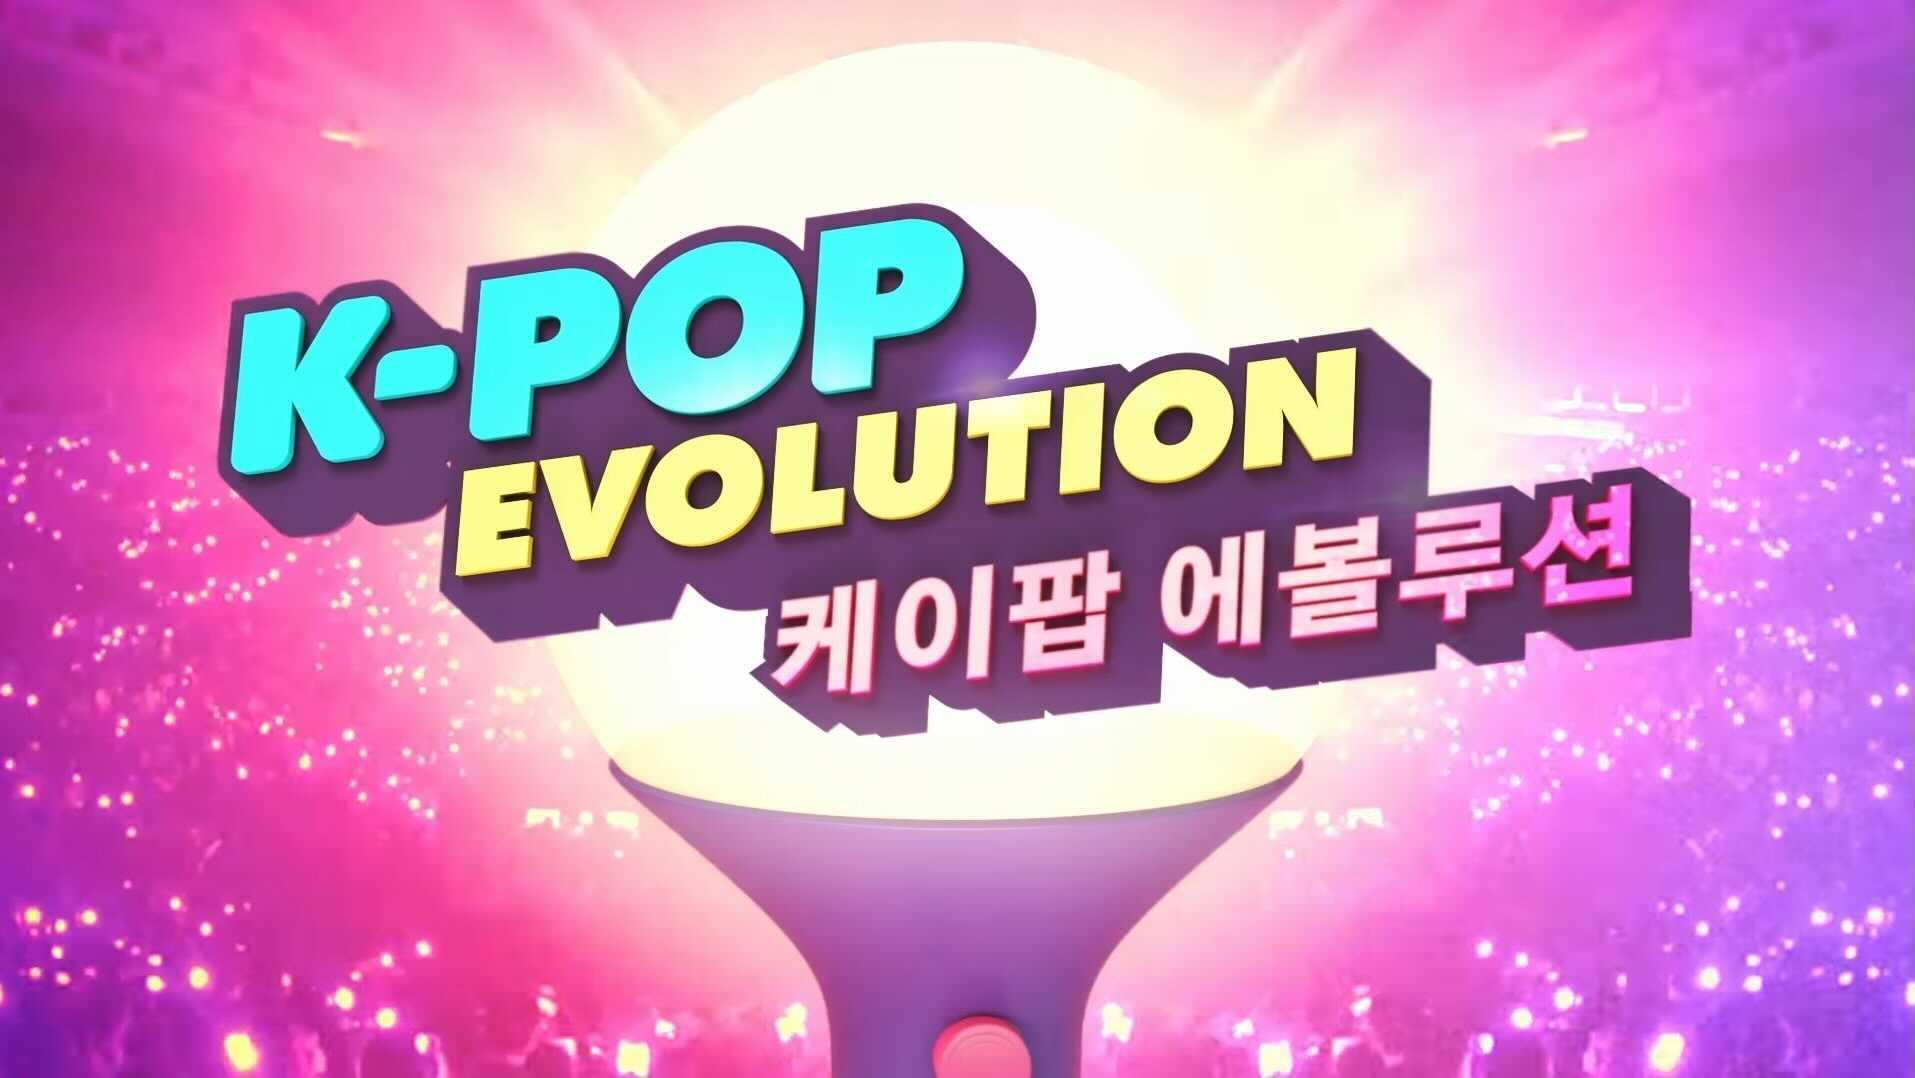 K-pop Evolution Trailer, Courtesy of Youtube Originals